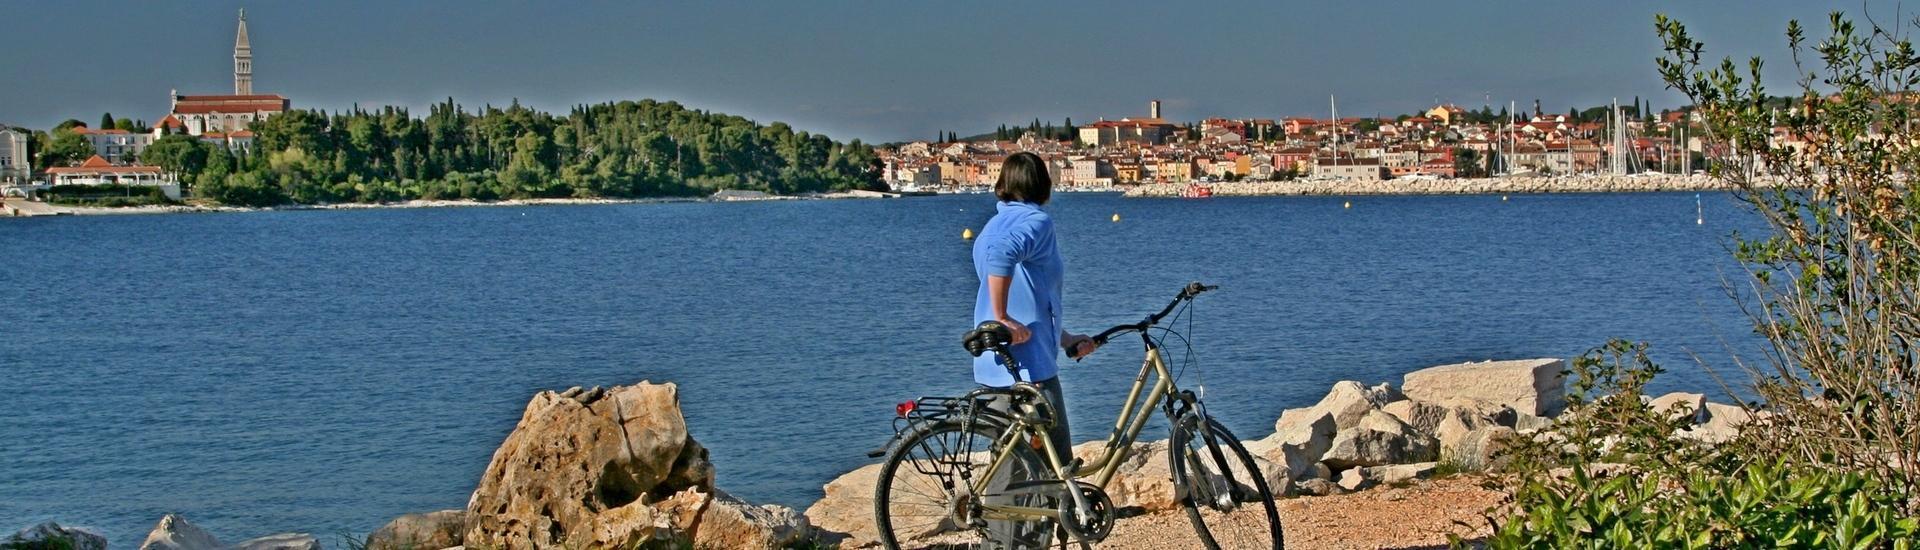 Istria - rowerowa kraina